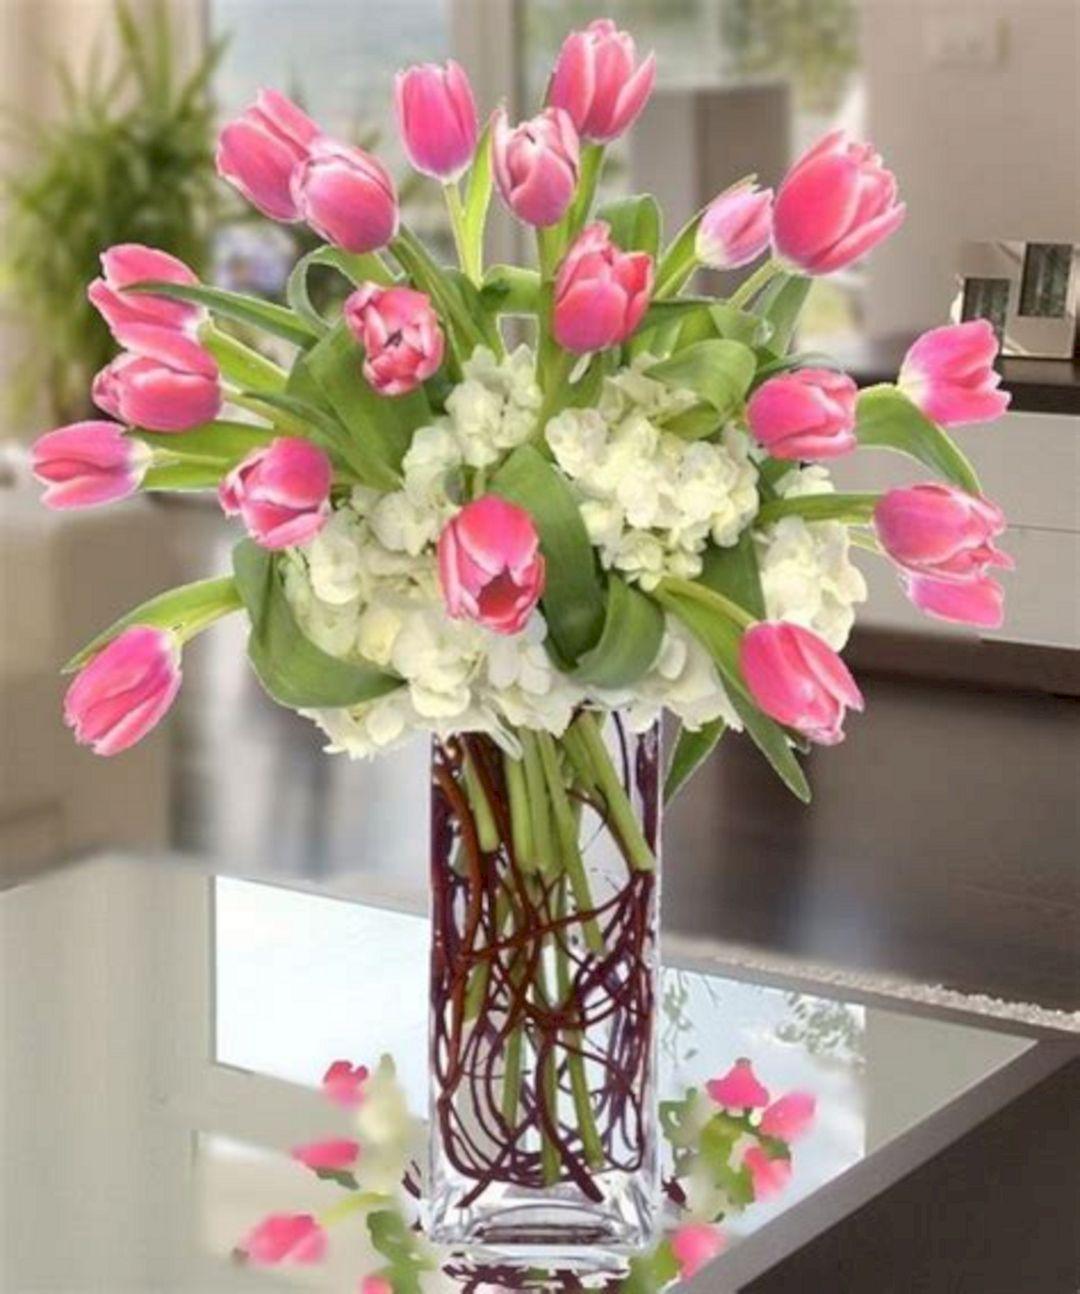 35 wonderful february floral ideas for best alternative